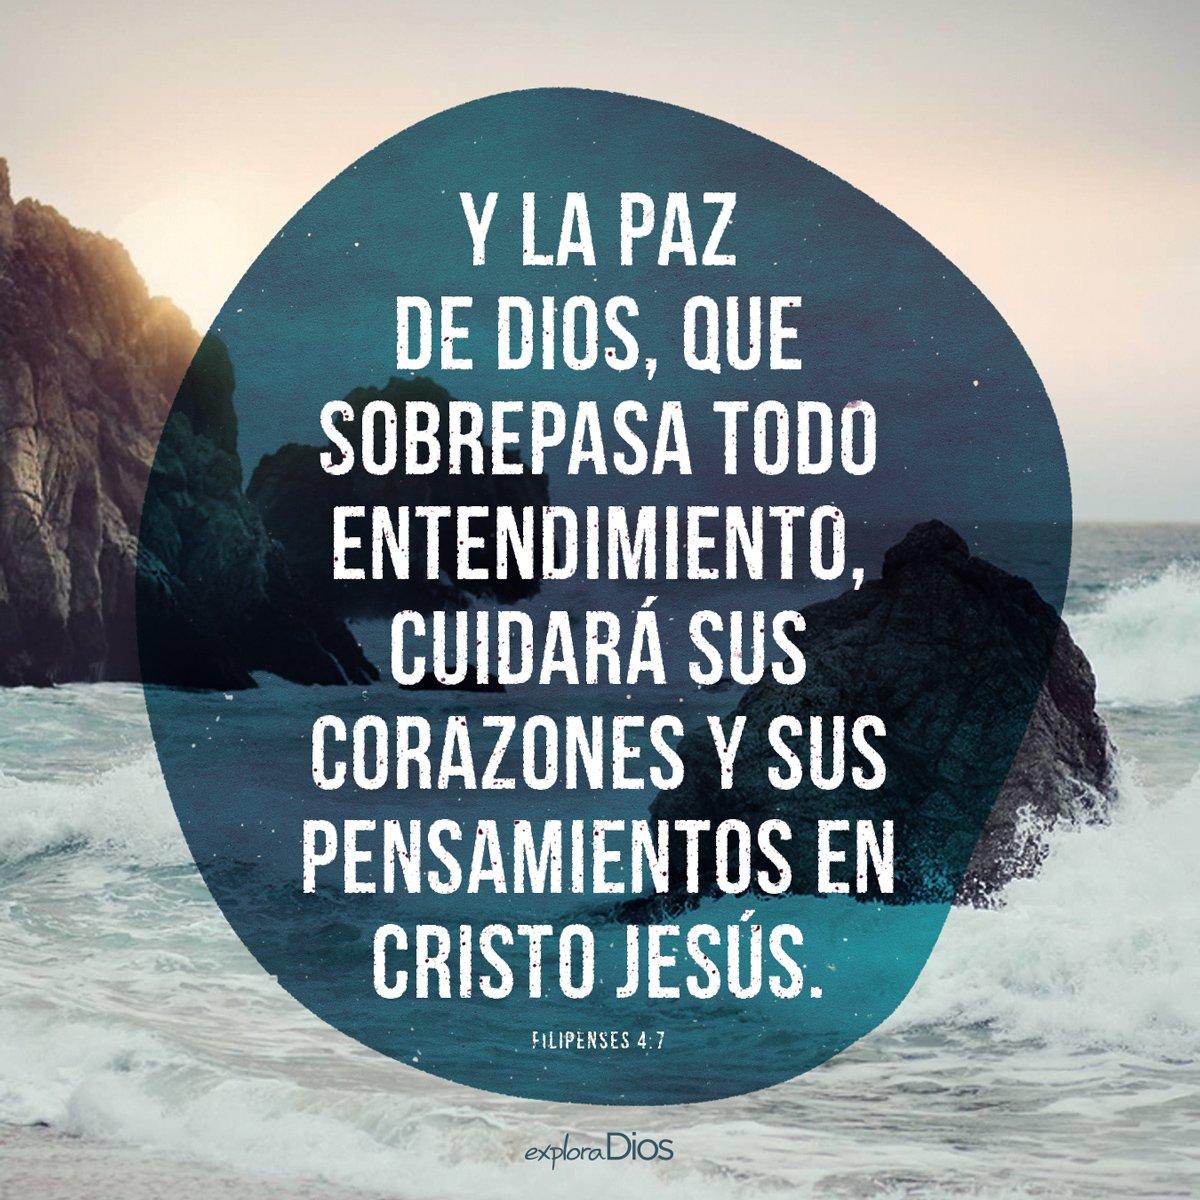 Geraldine Weber On Twitter Filipenses 4 7 Y La Paz De